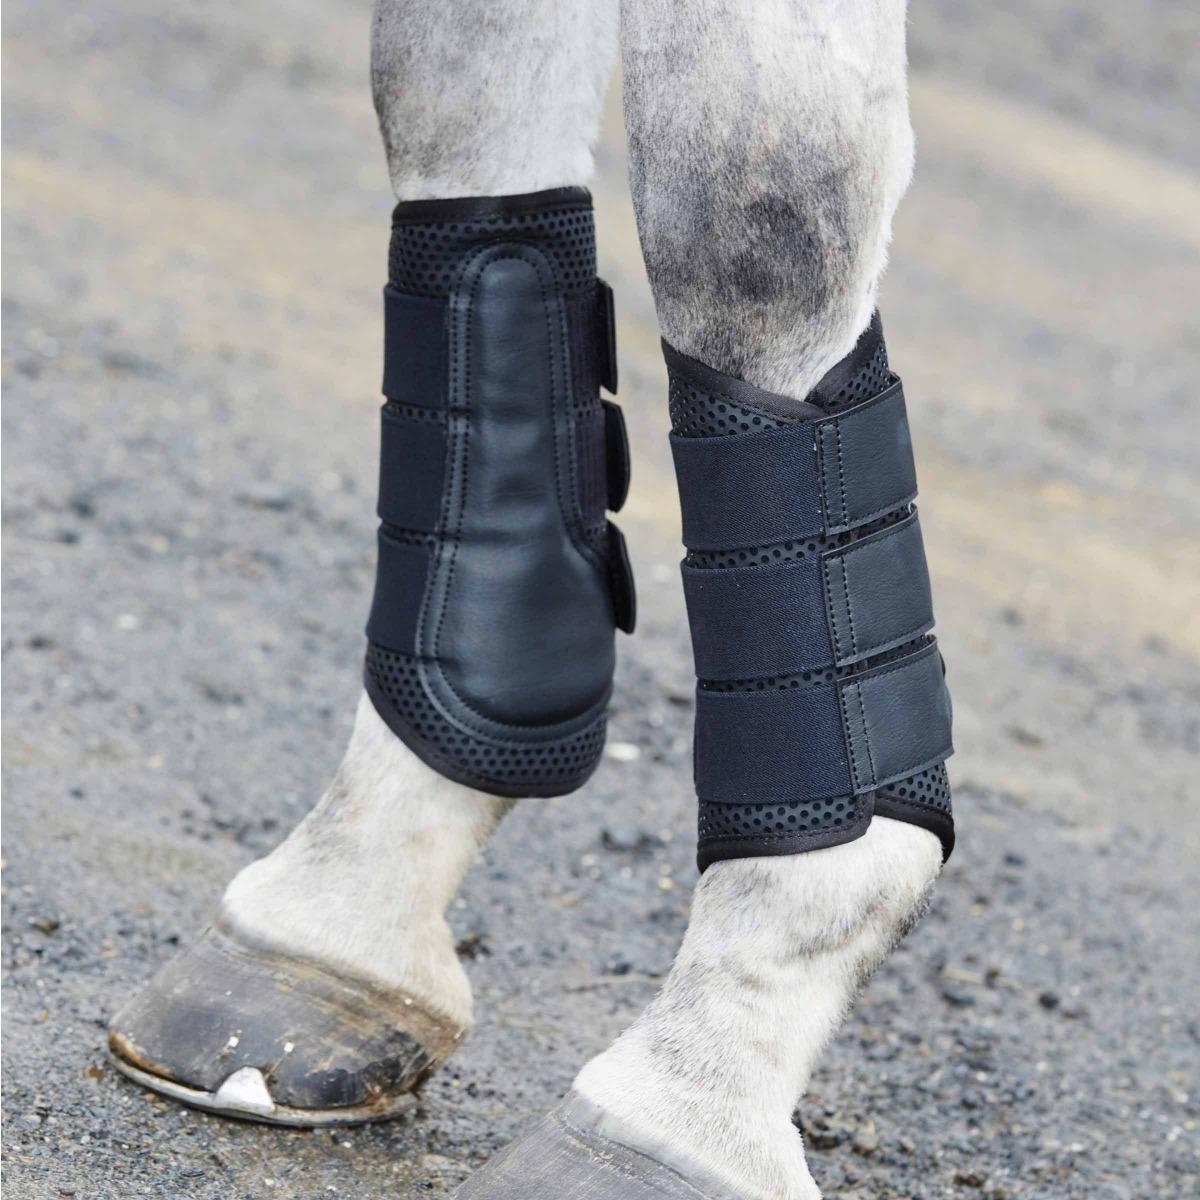 weatherbeeta brushing boots